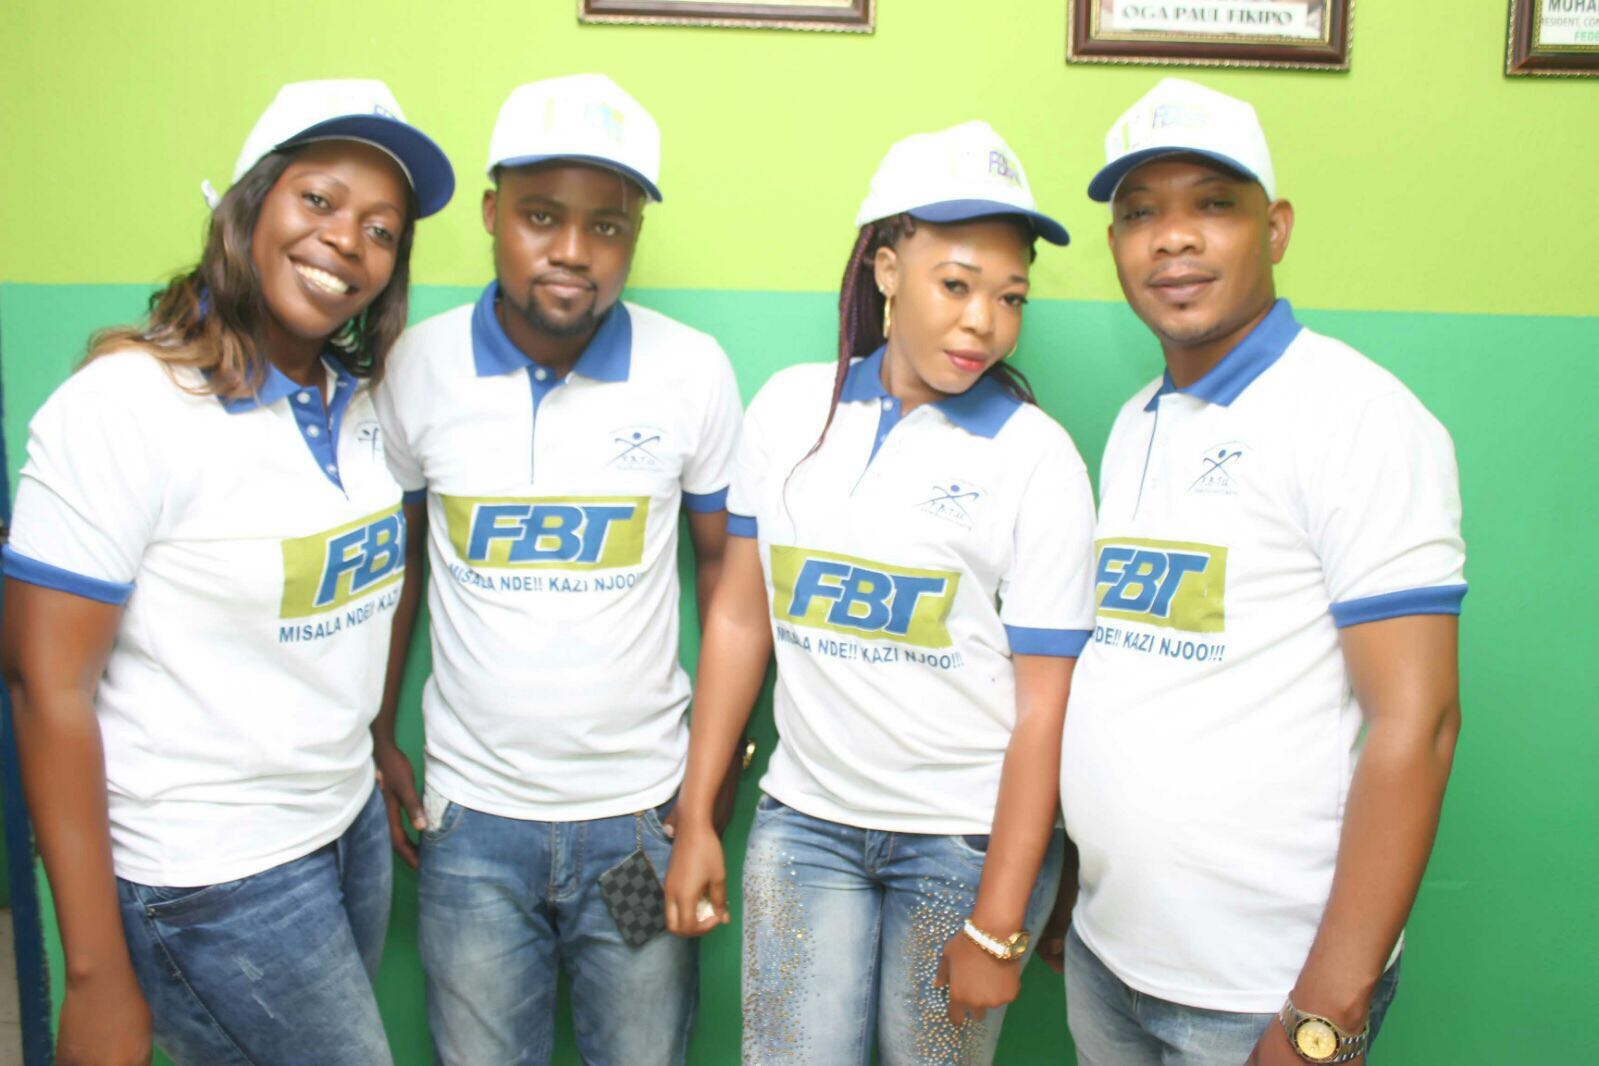 FBT Nigeria 2